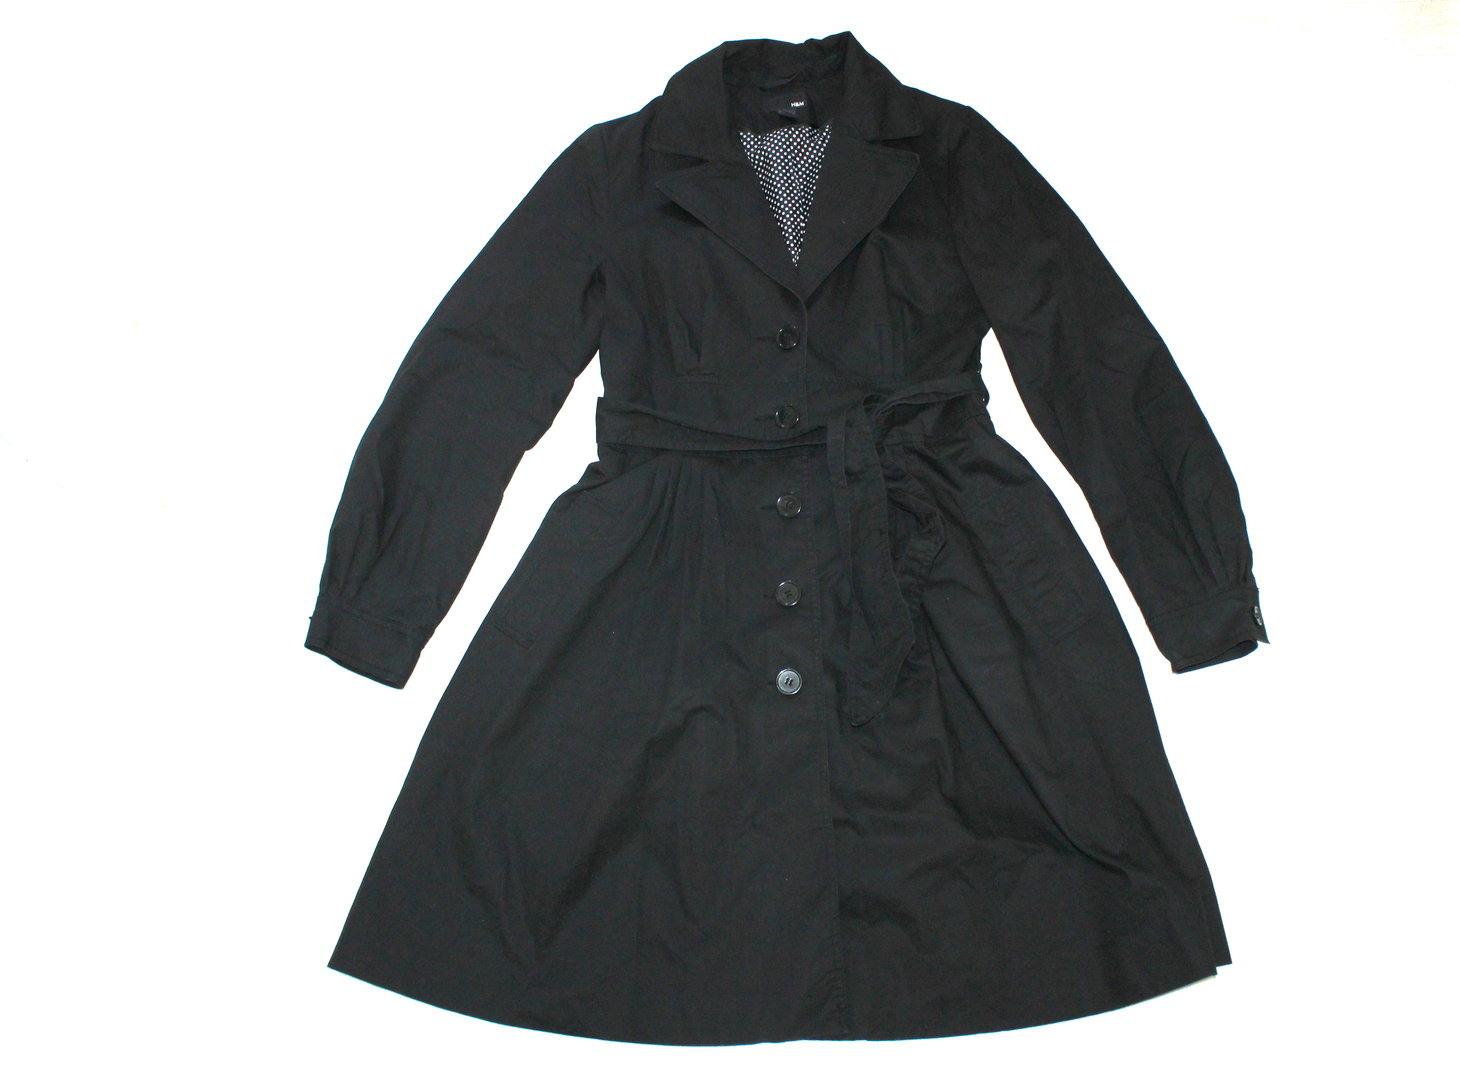 Hm Kleider Mantel Sommer Übergang Damen Schwarz Wolkengangde